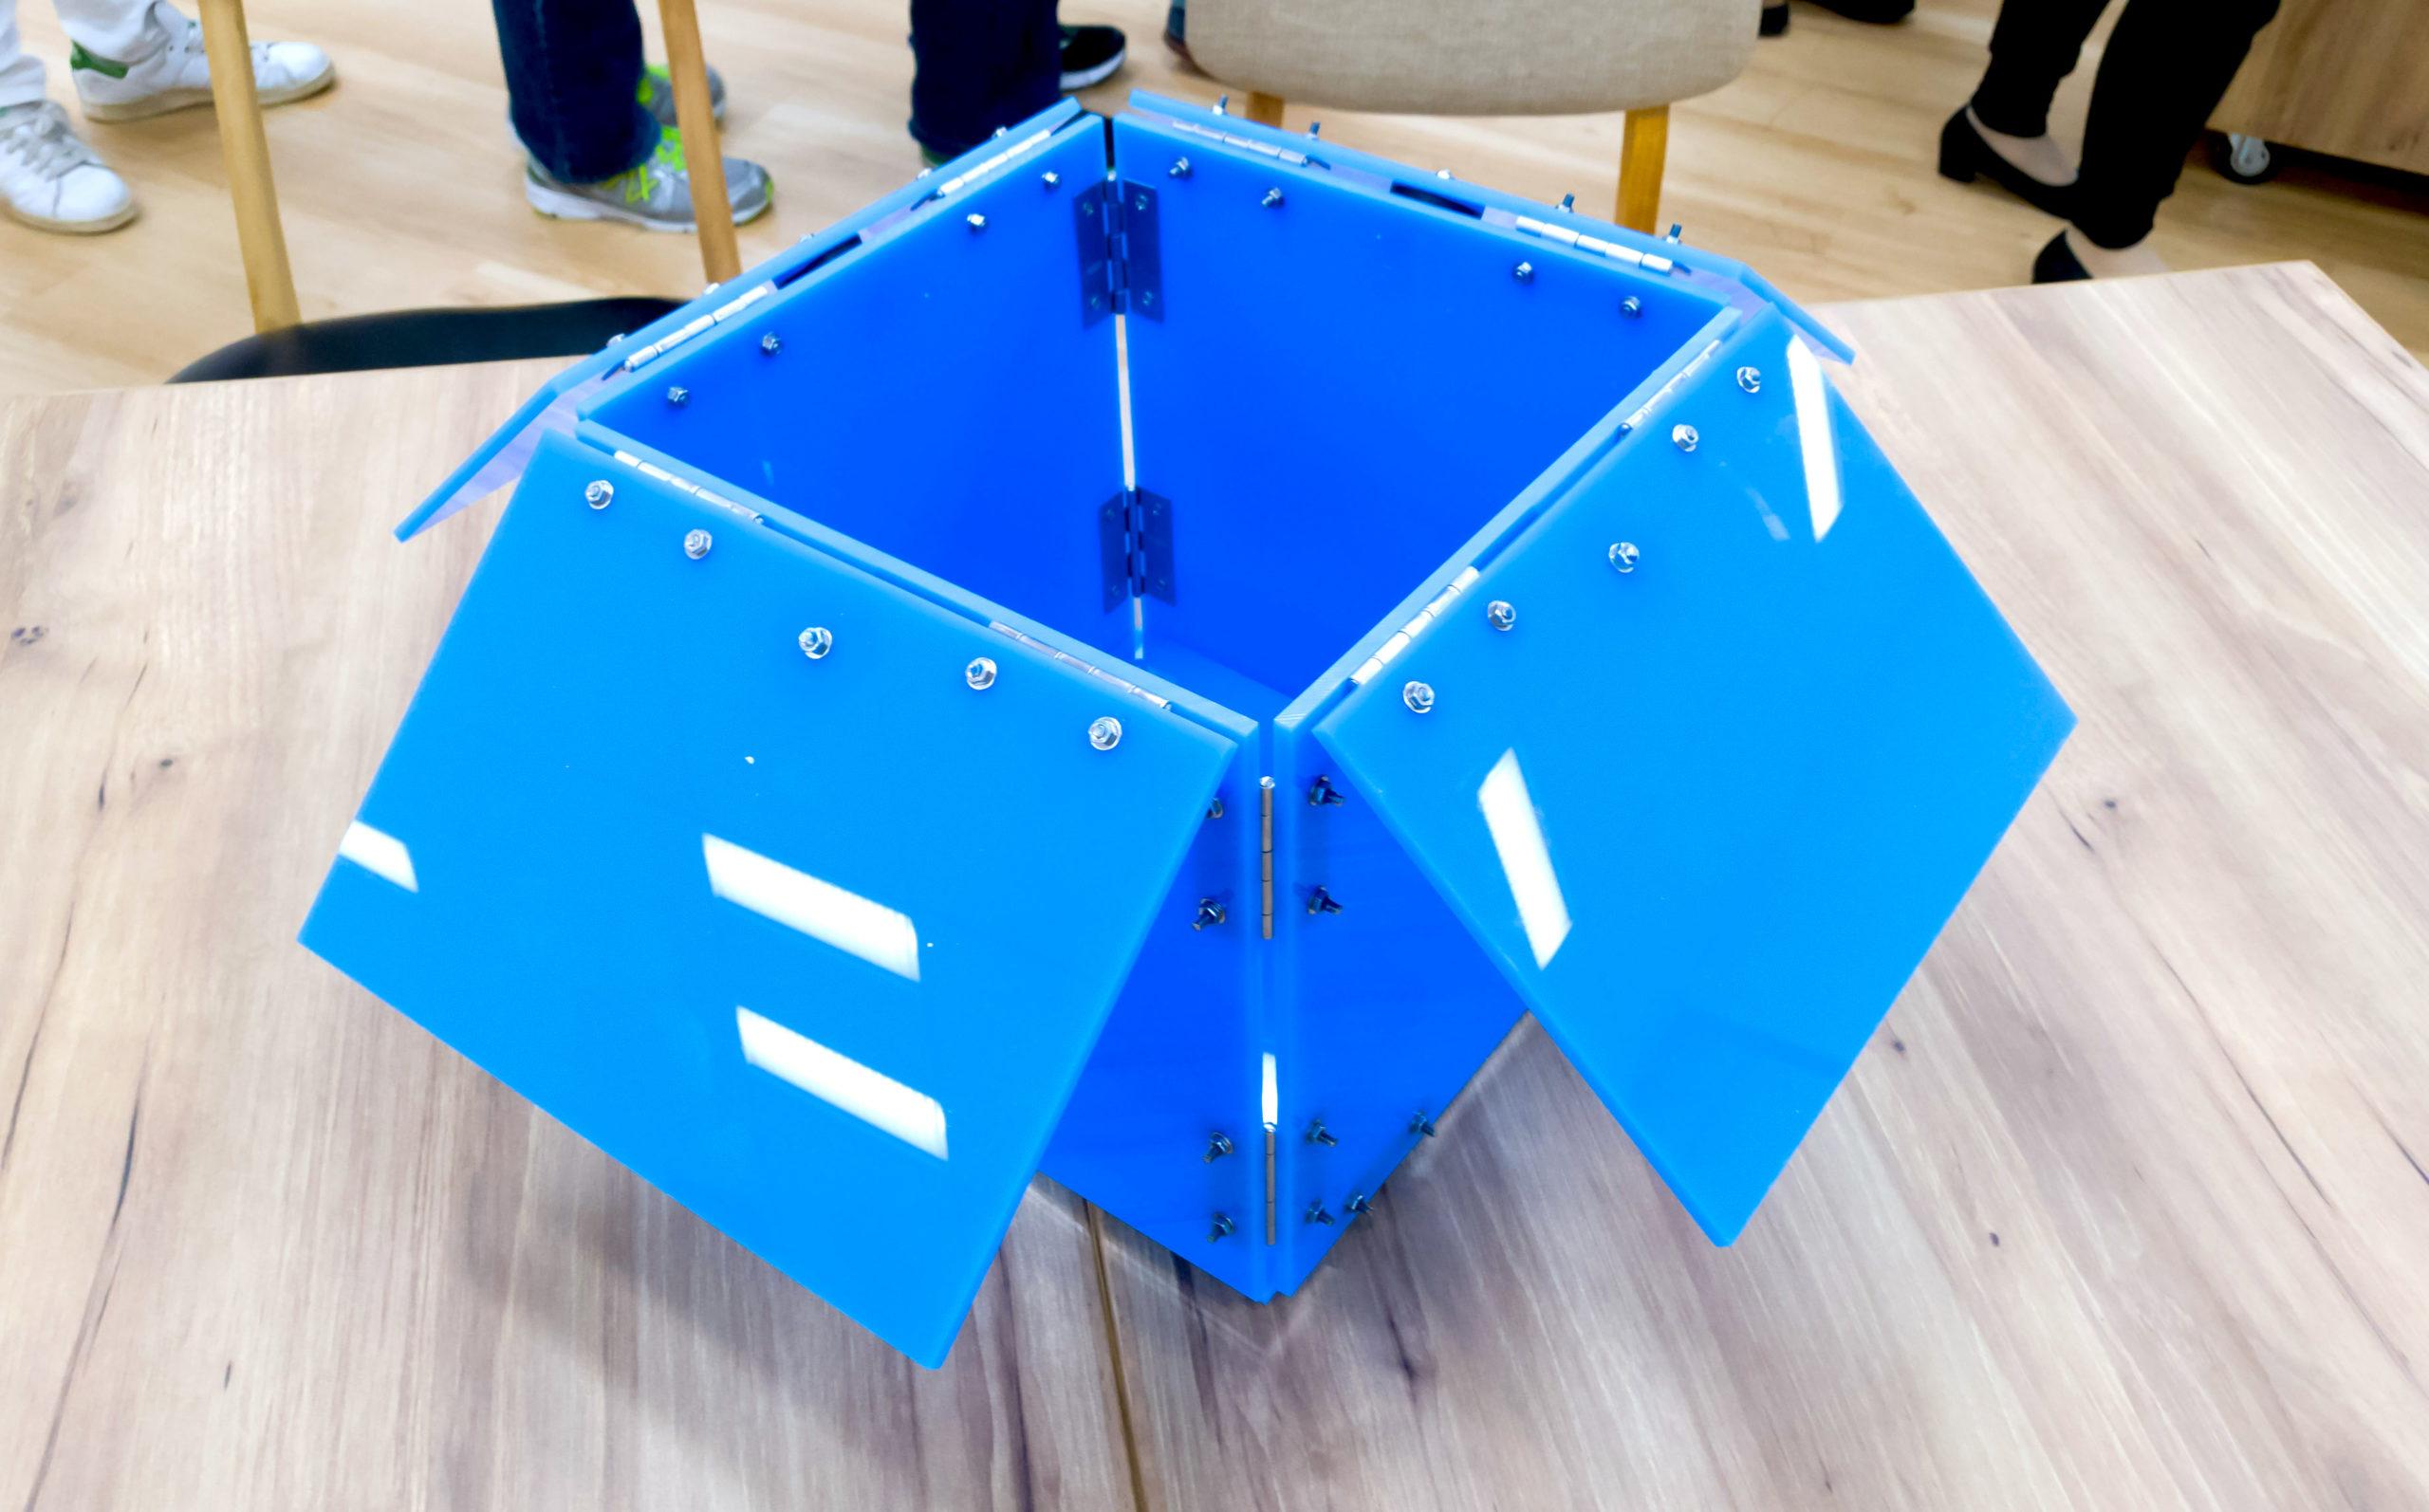 Dropboxアンバサダー キックオフイベントに参加しました